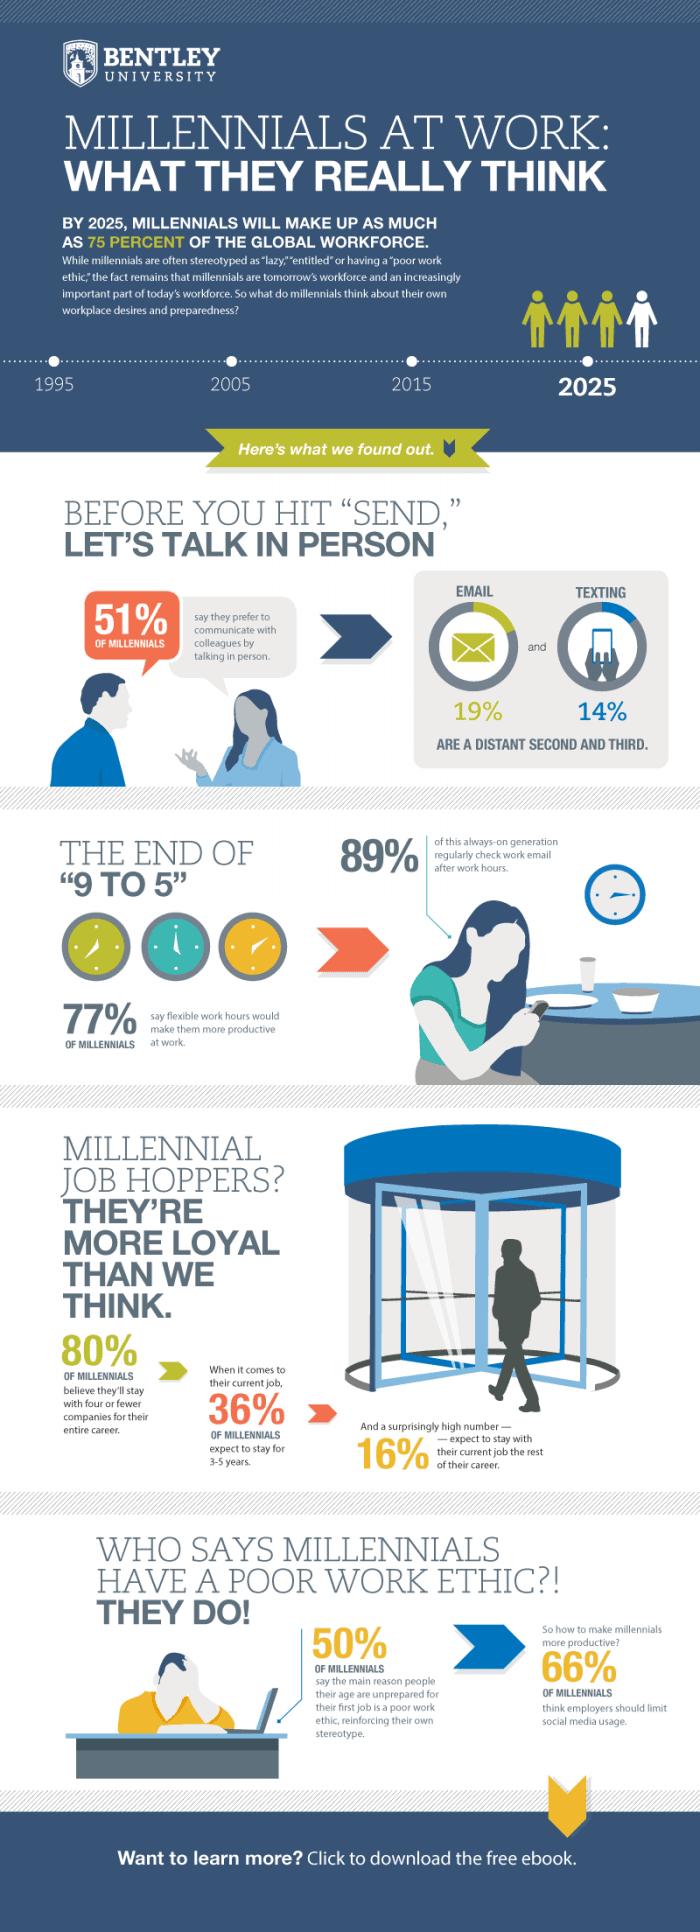 Millenials at Work Infographic